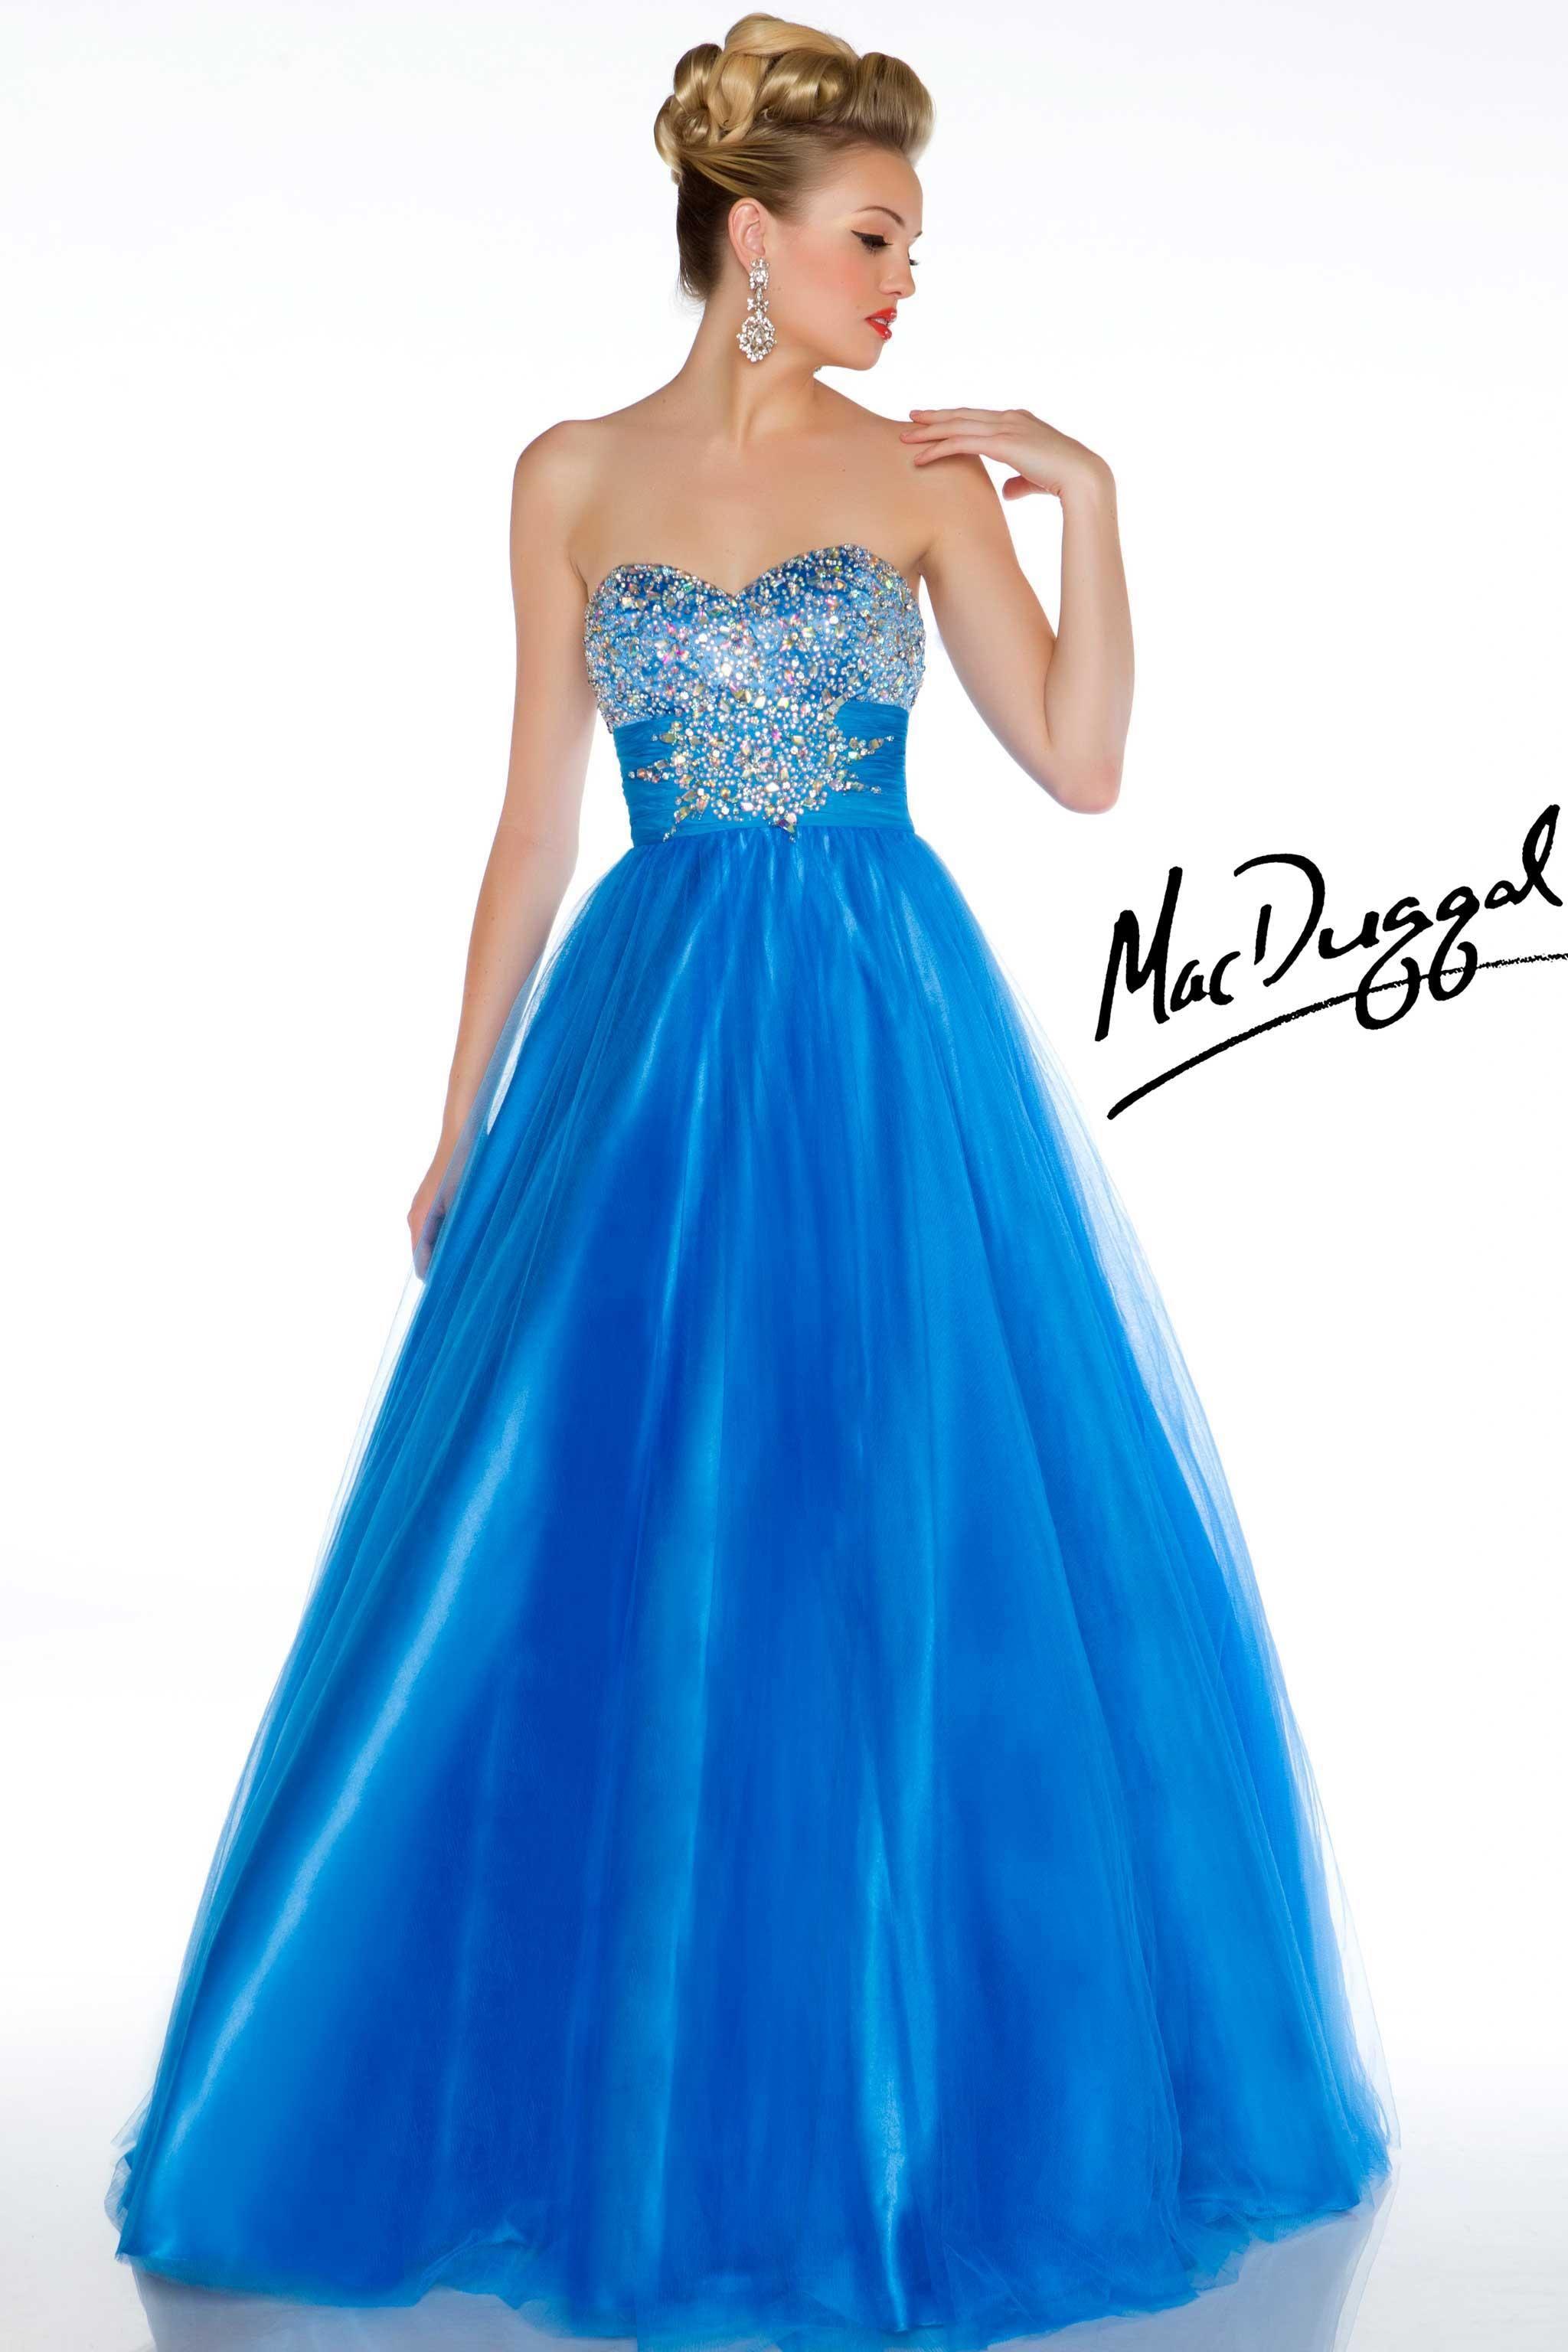 Fresh blue ball gown mac duggal h fancy attireuc pinterest